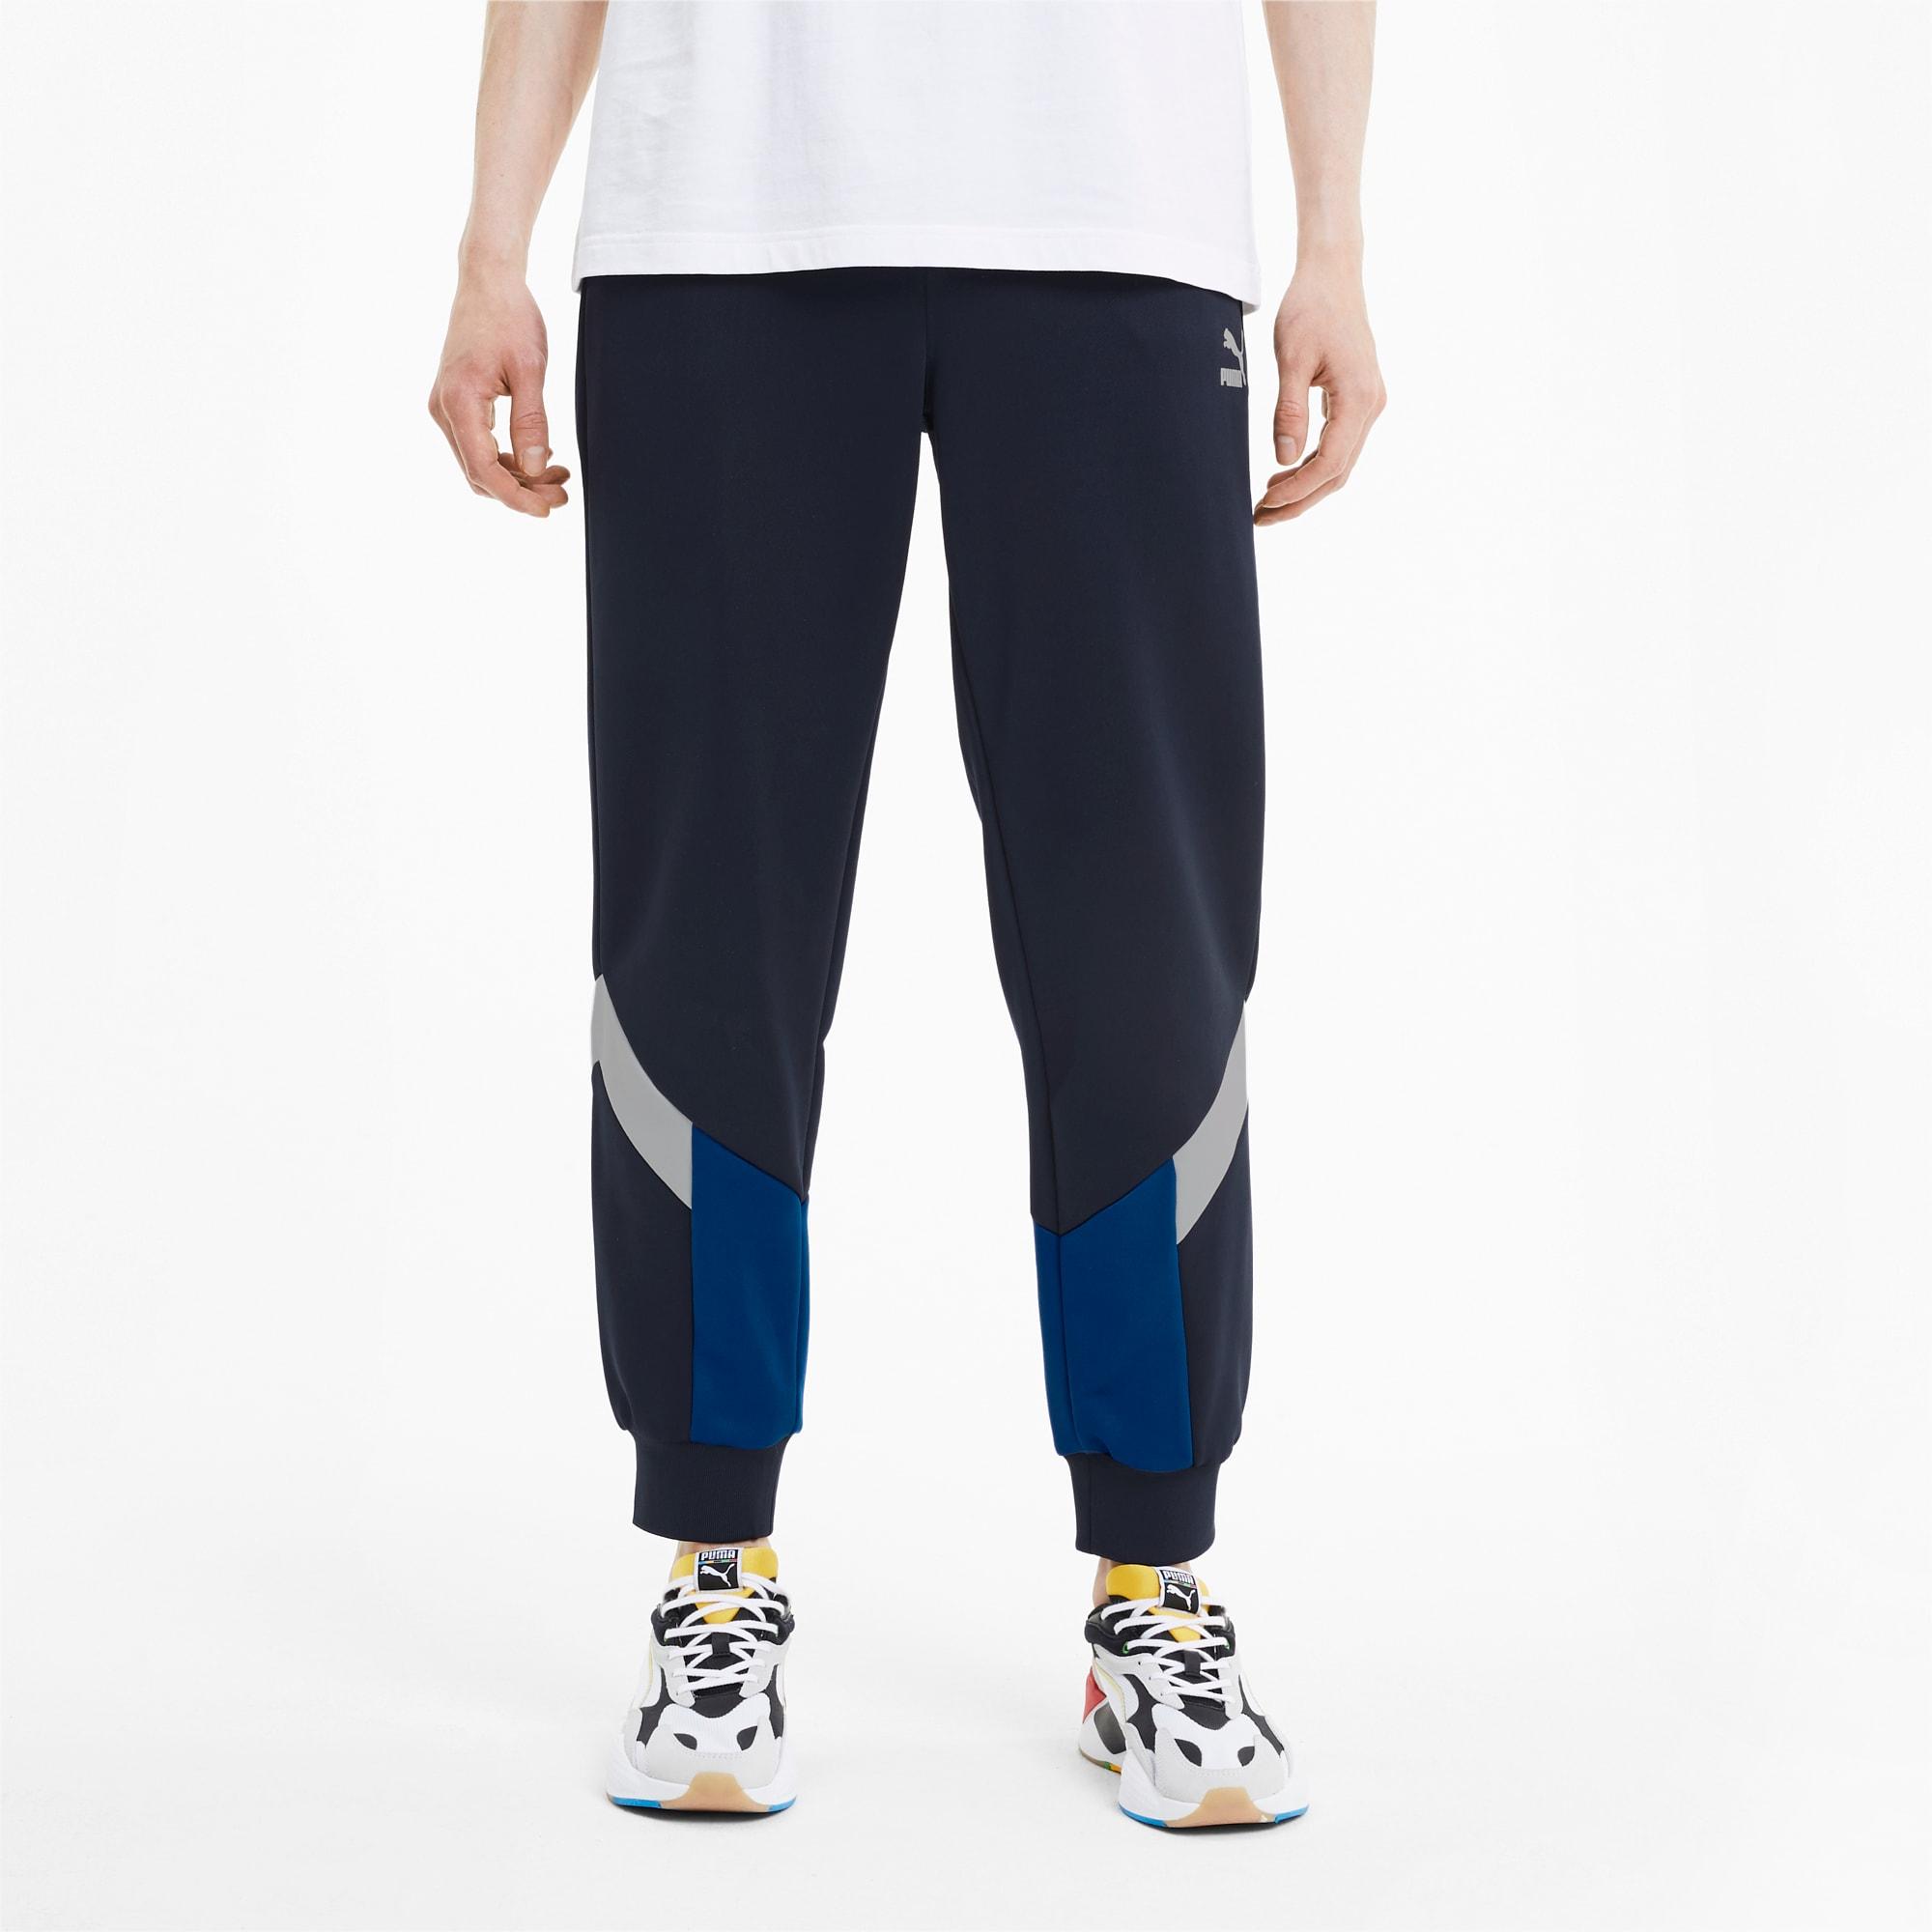 puma -  Iconic MCS Knitted Herren Trainingshose | Blau | Größe: L